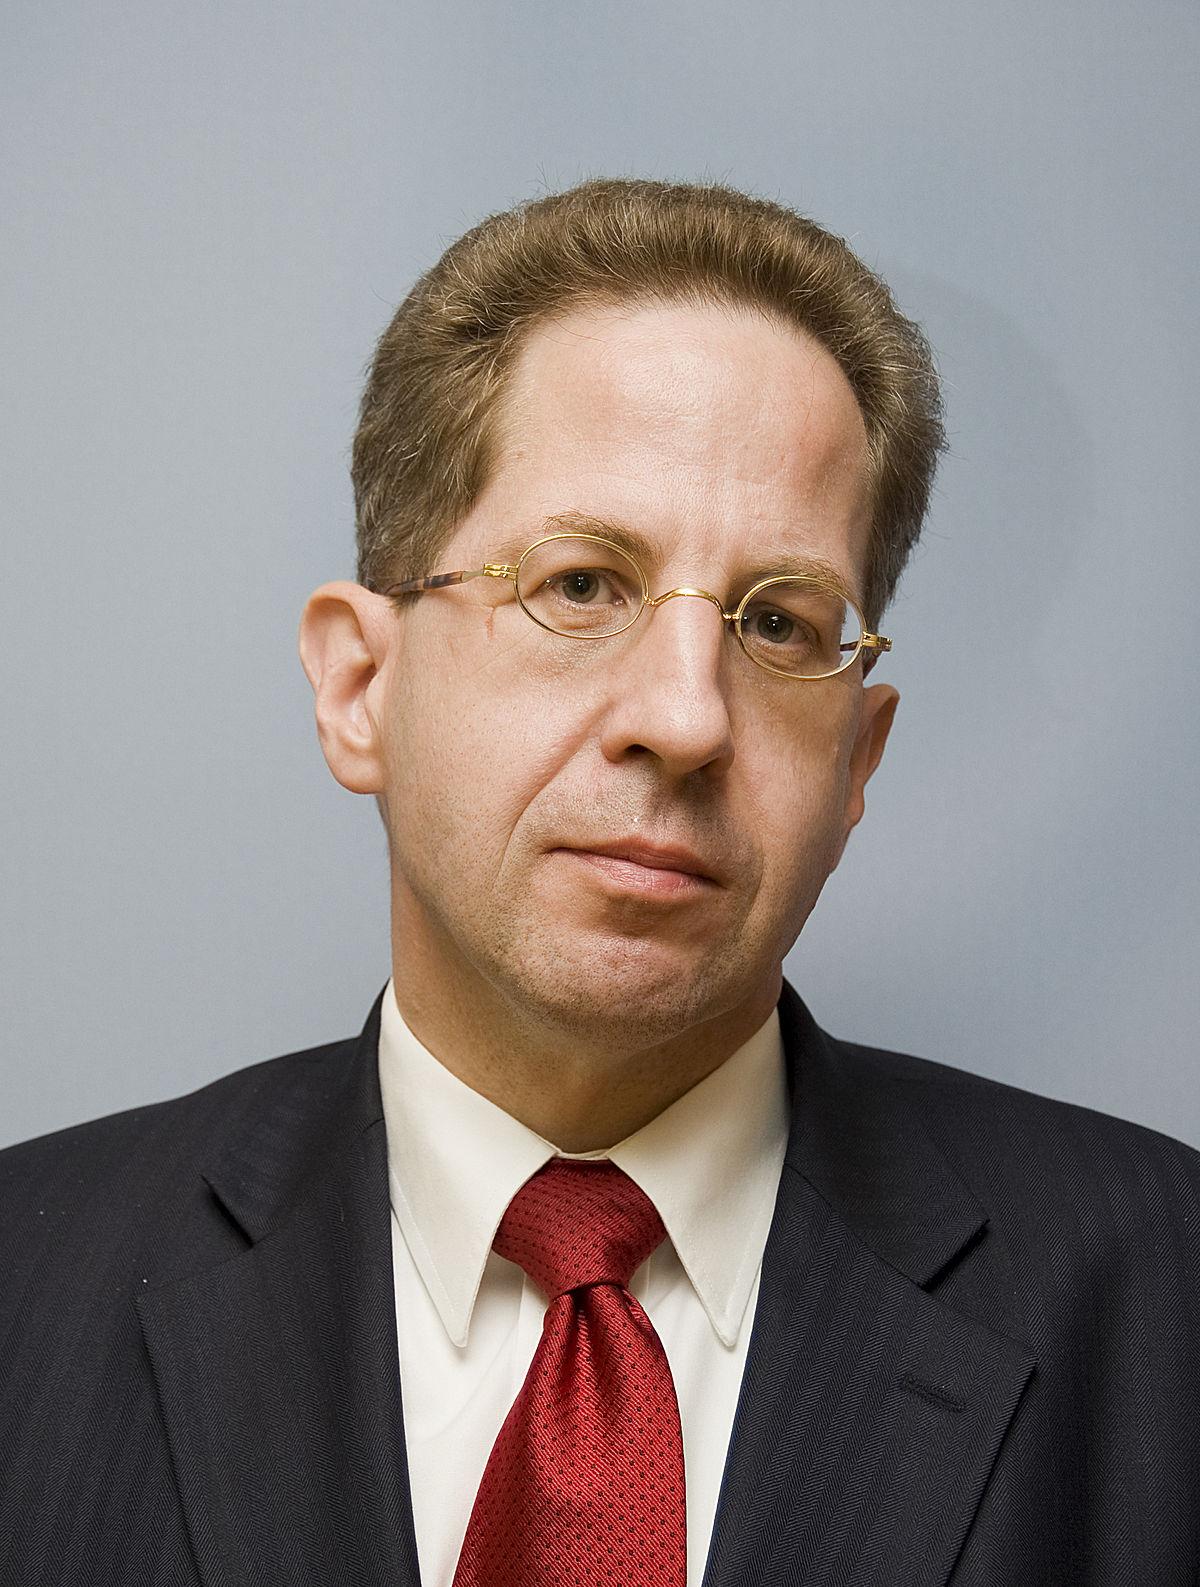 Hans-Georg Maaßen - Wikipedia